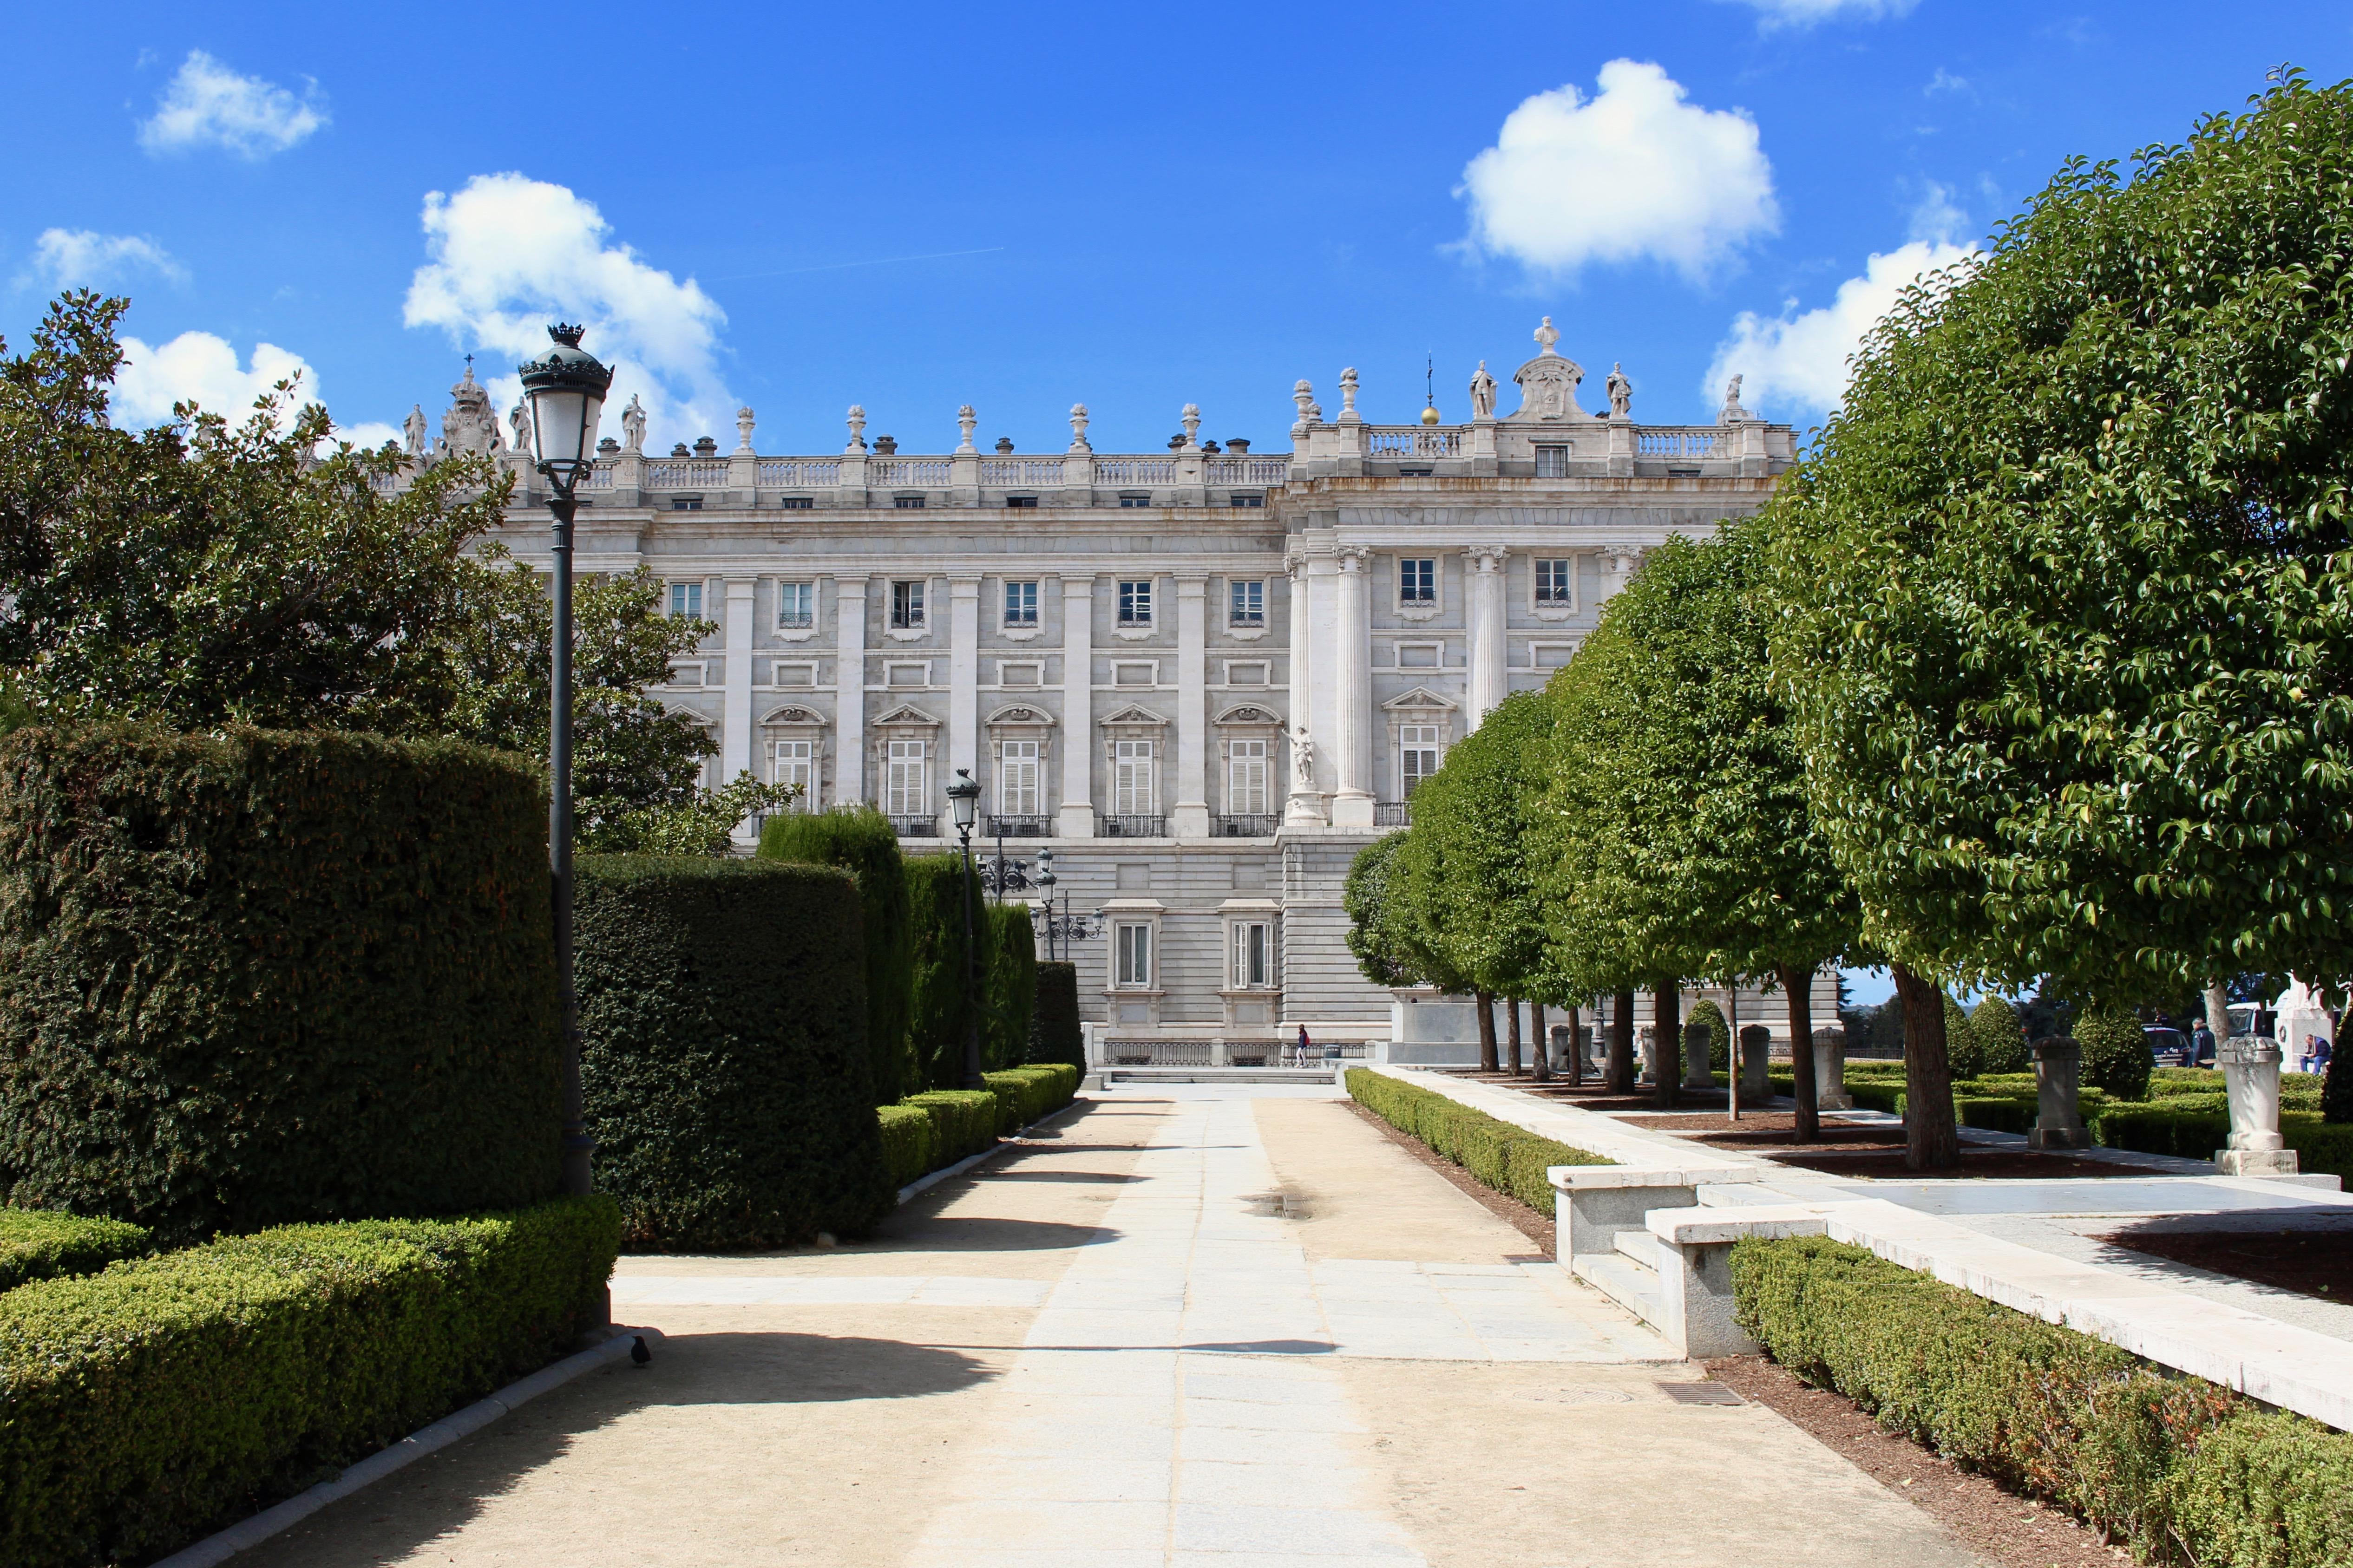 The resplendent royal palace